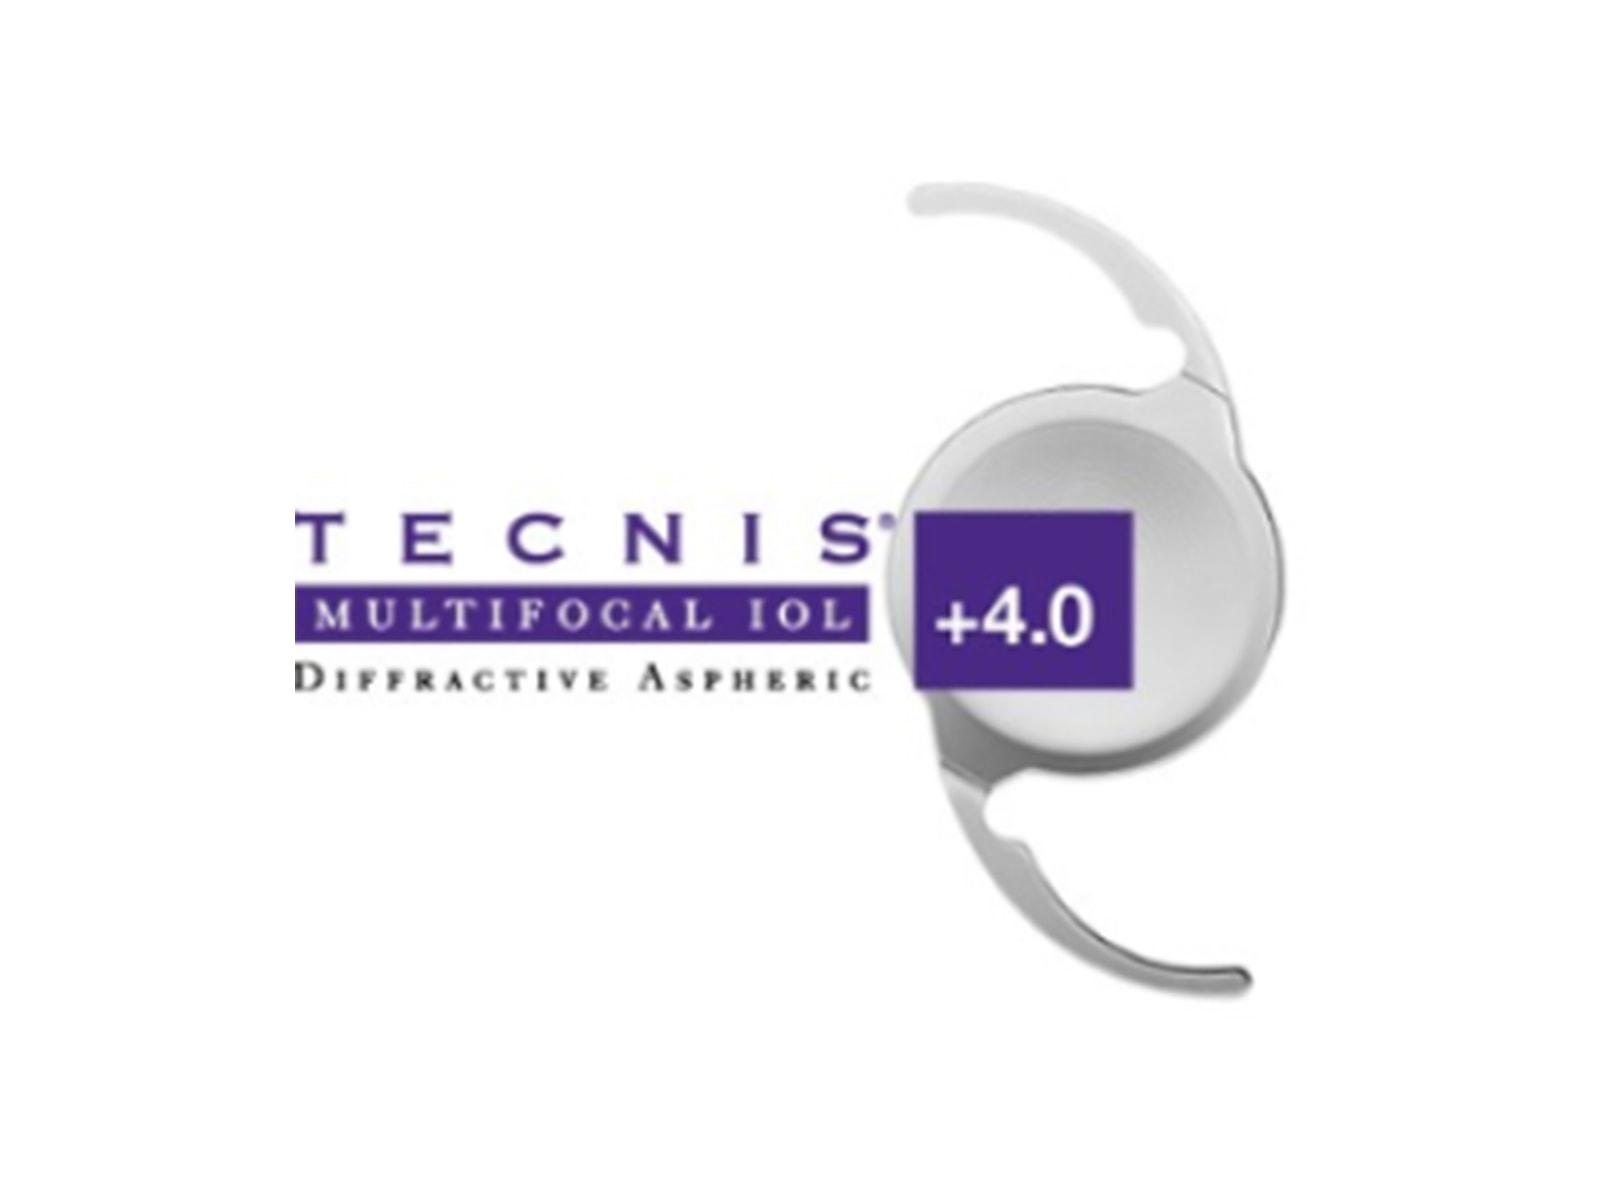 TECNIS Multifocal IOL +4.0 D